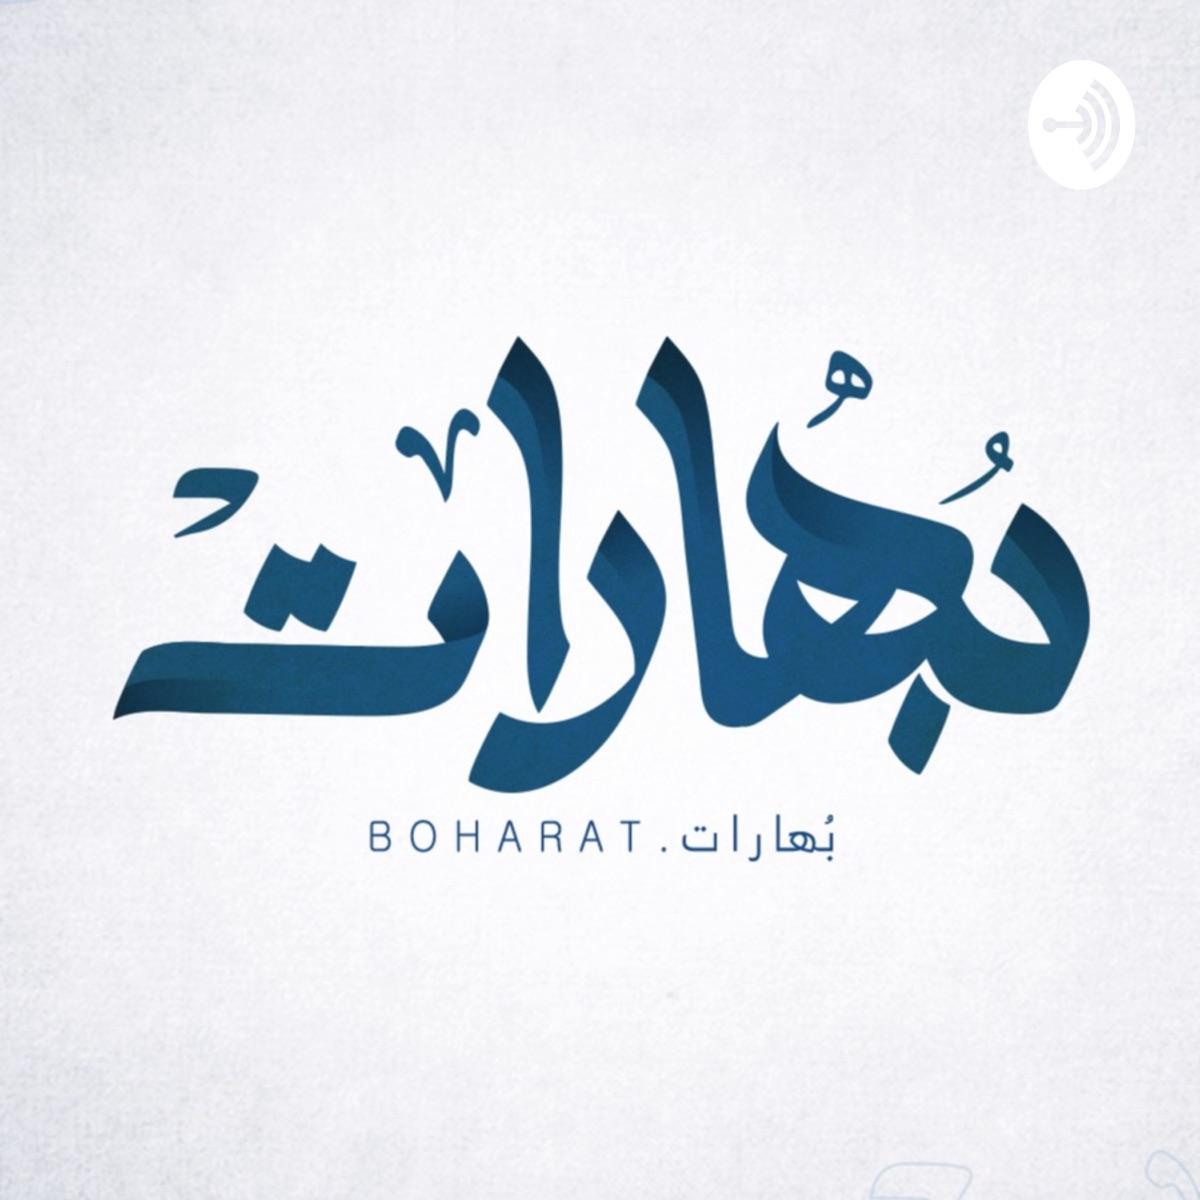 Boharat | بُهارات